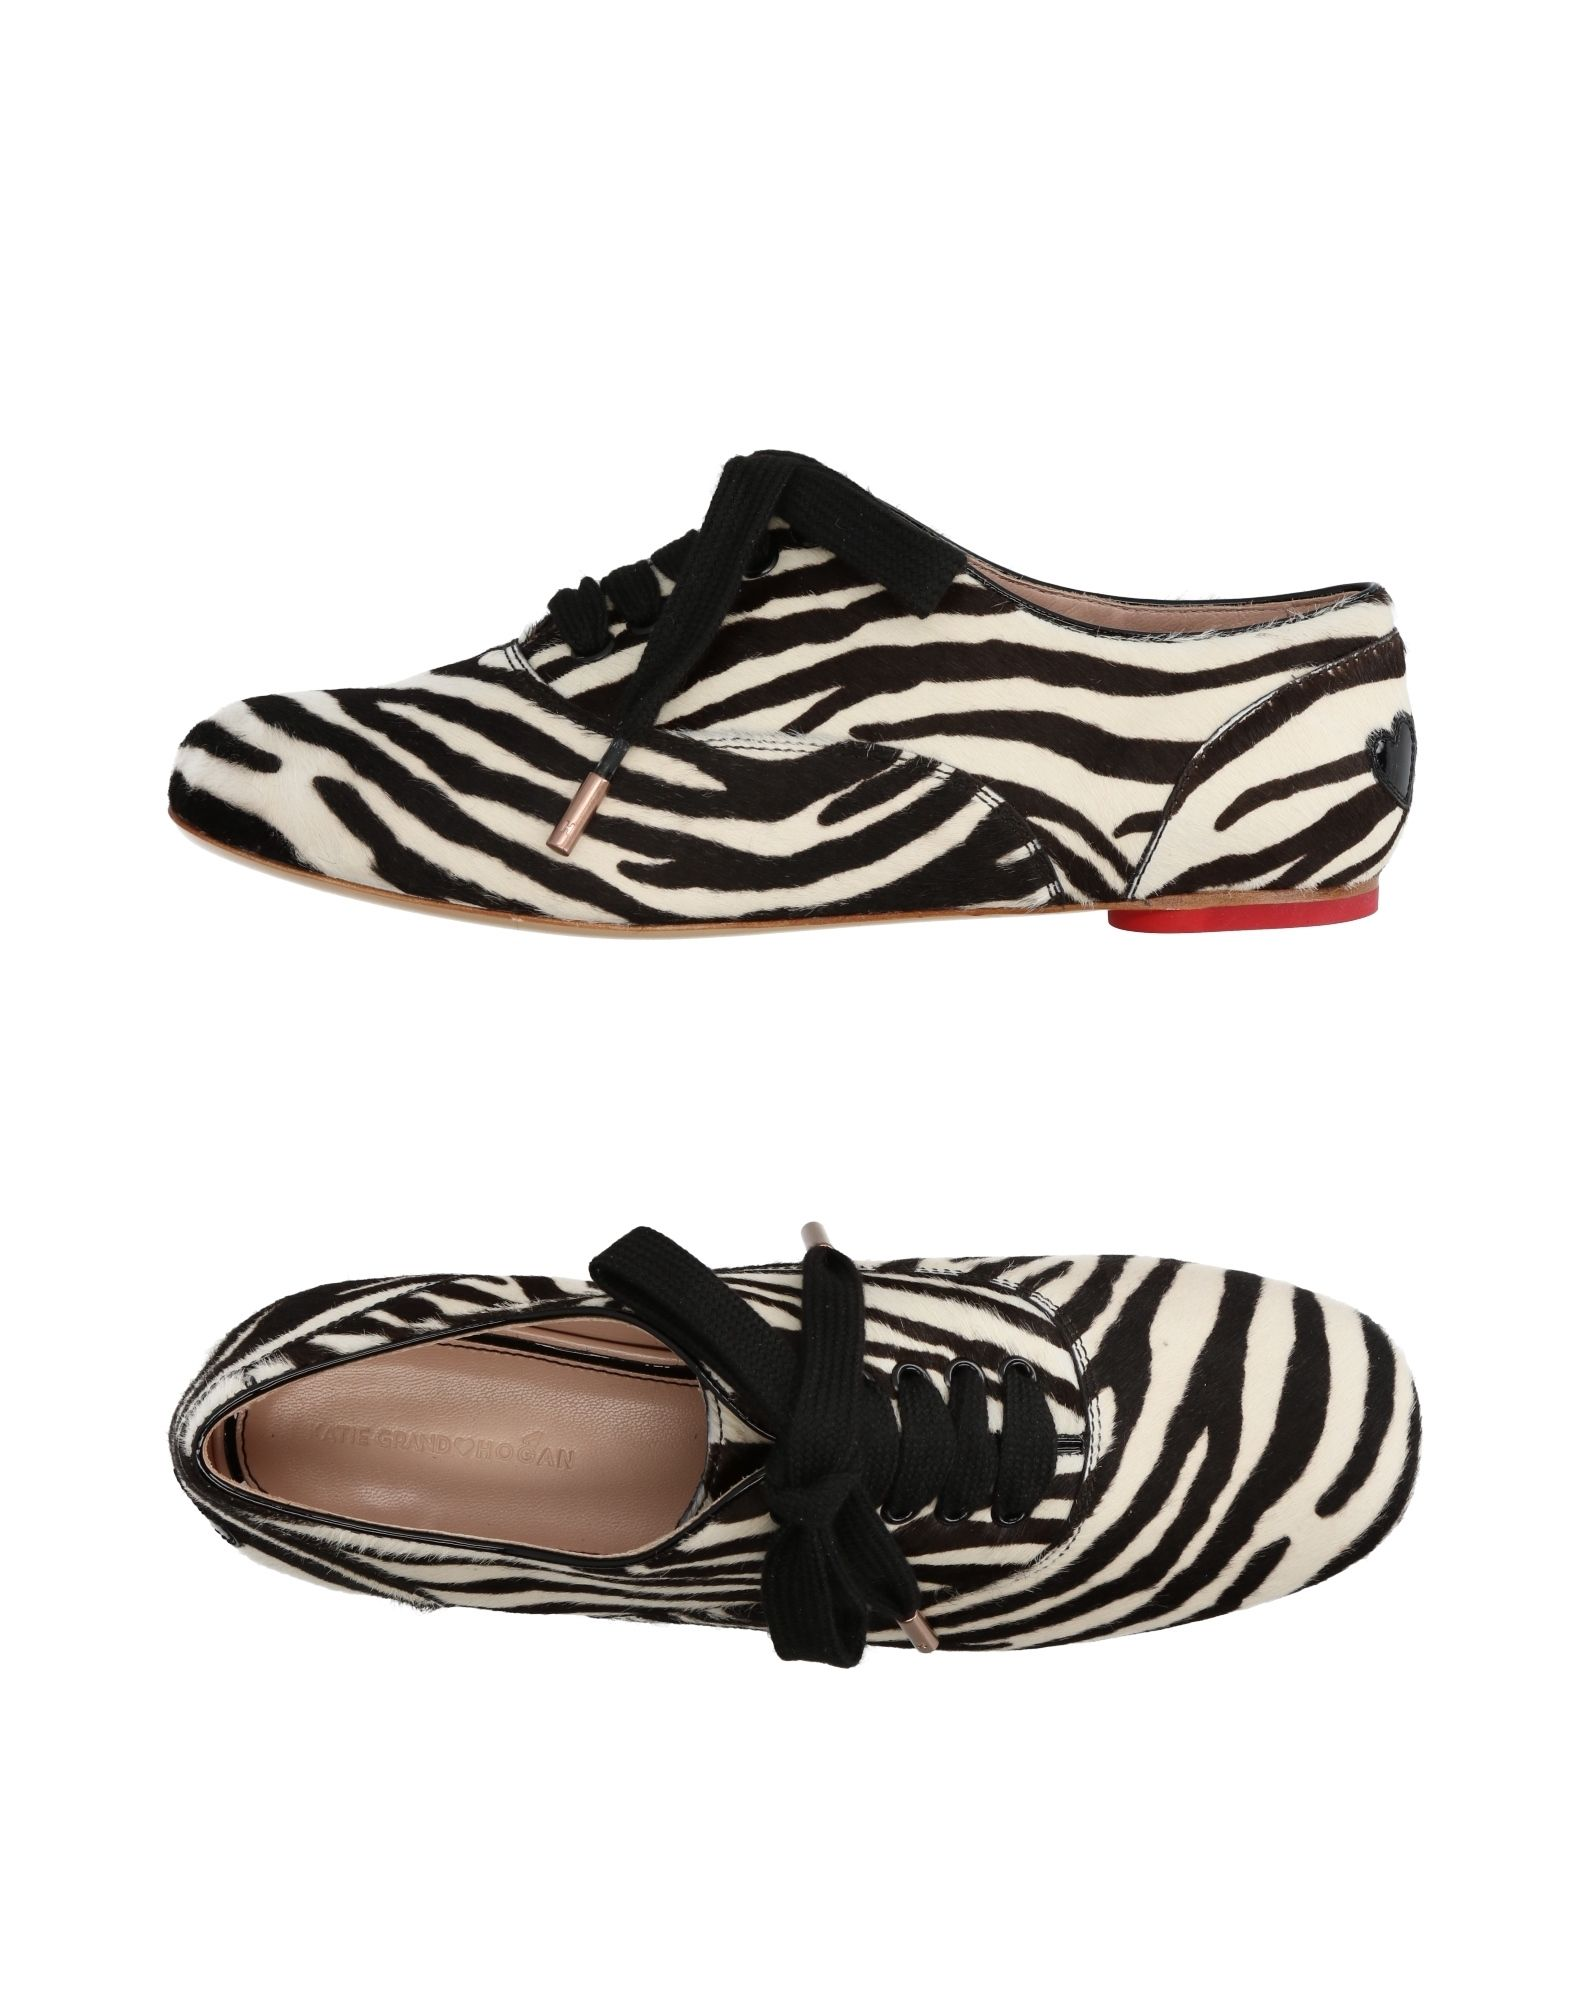 Rabatt Schuhe Katie Grand Loves Hogan Schnürschuhe Damen  11298351UI